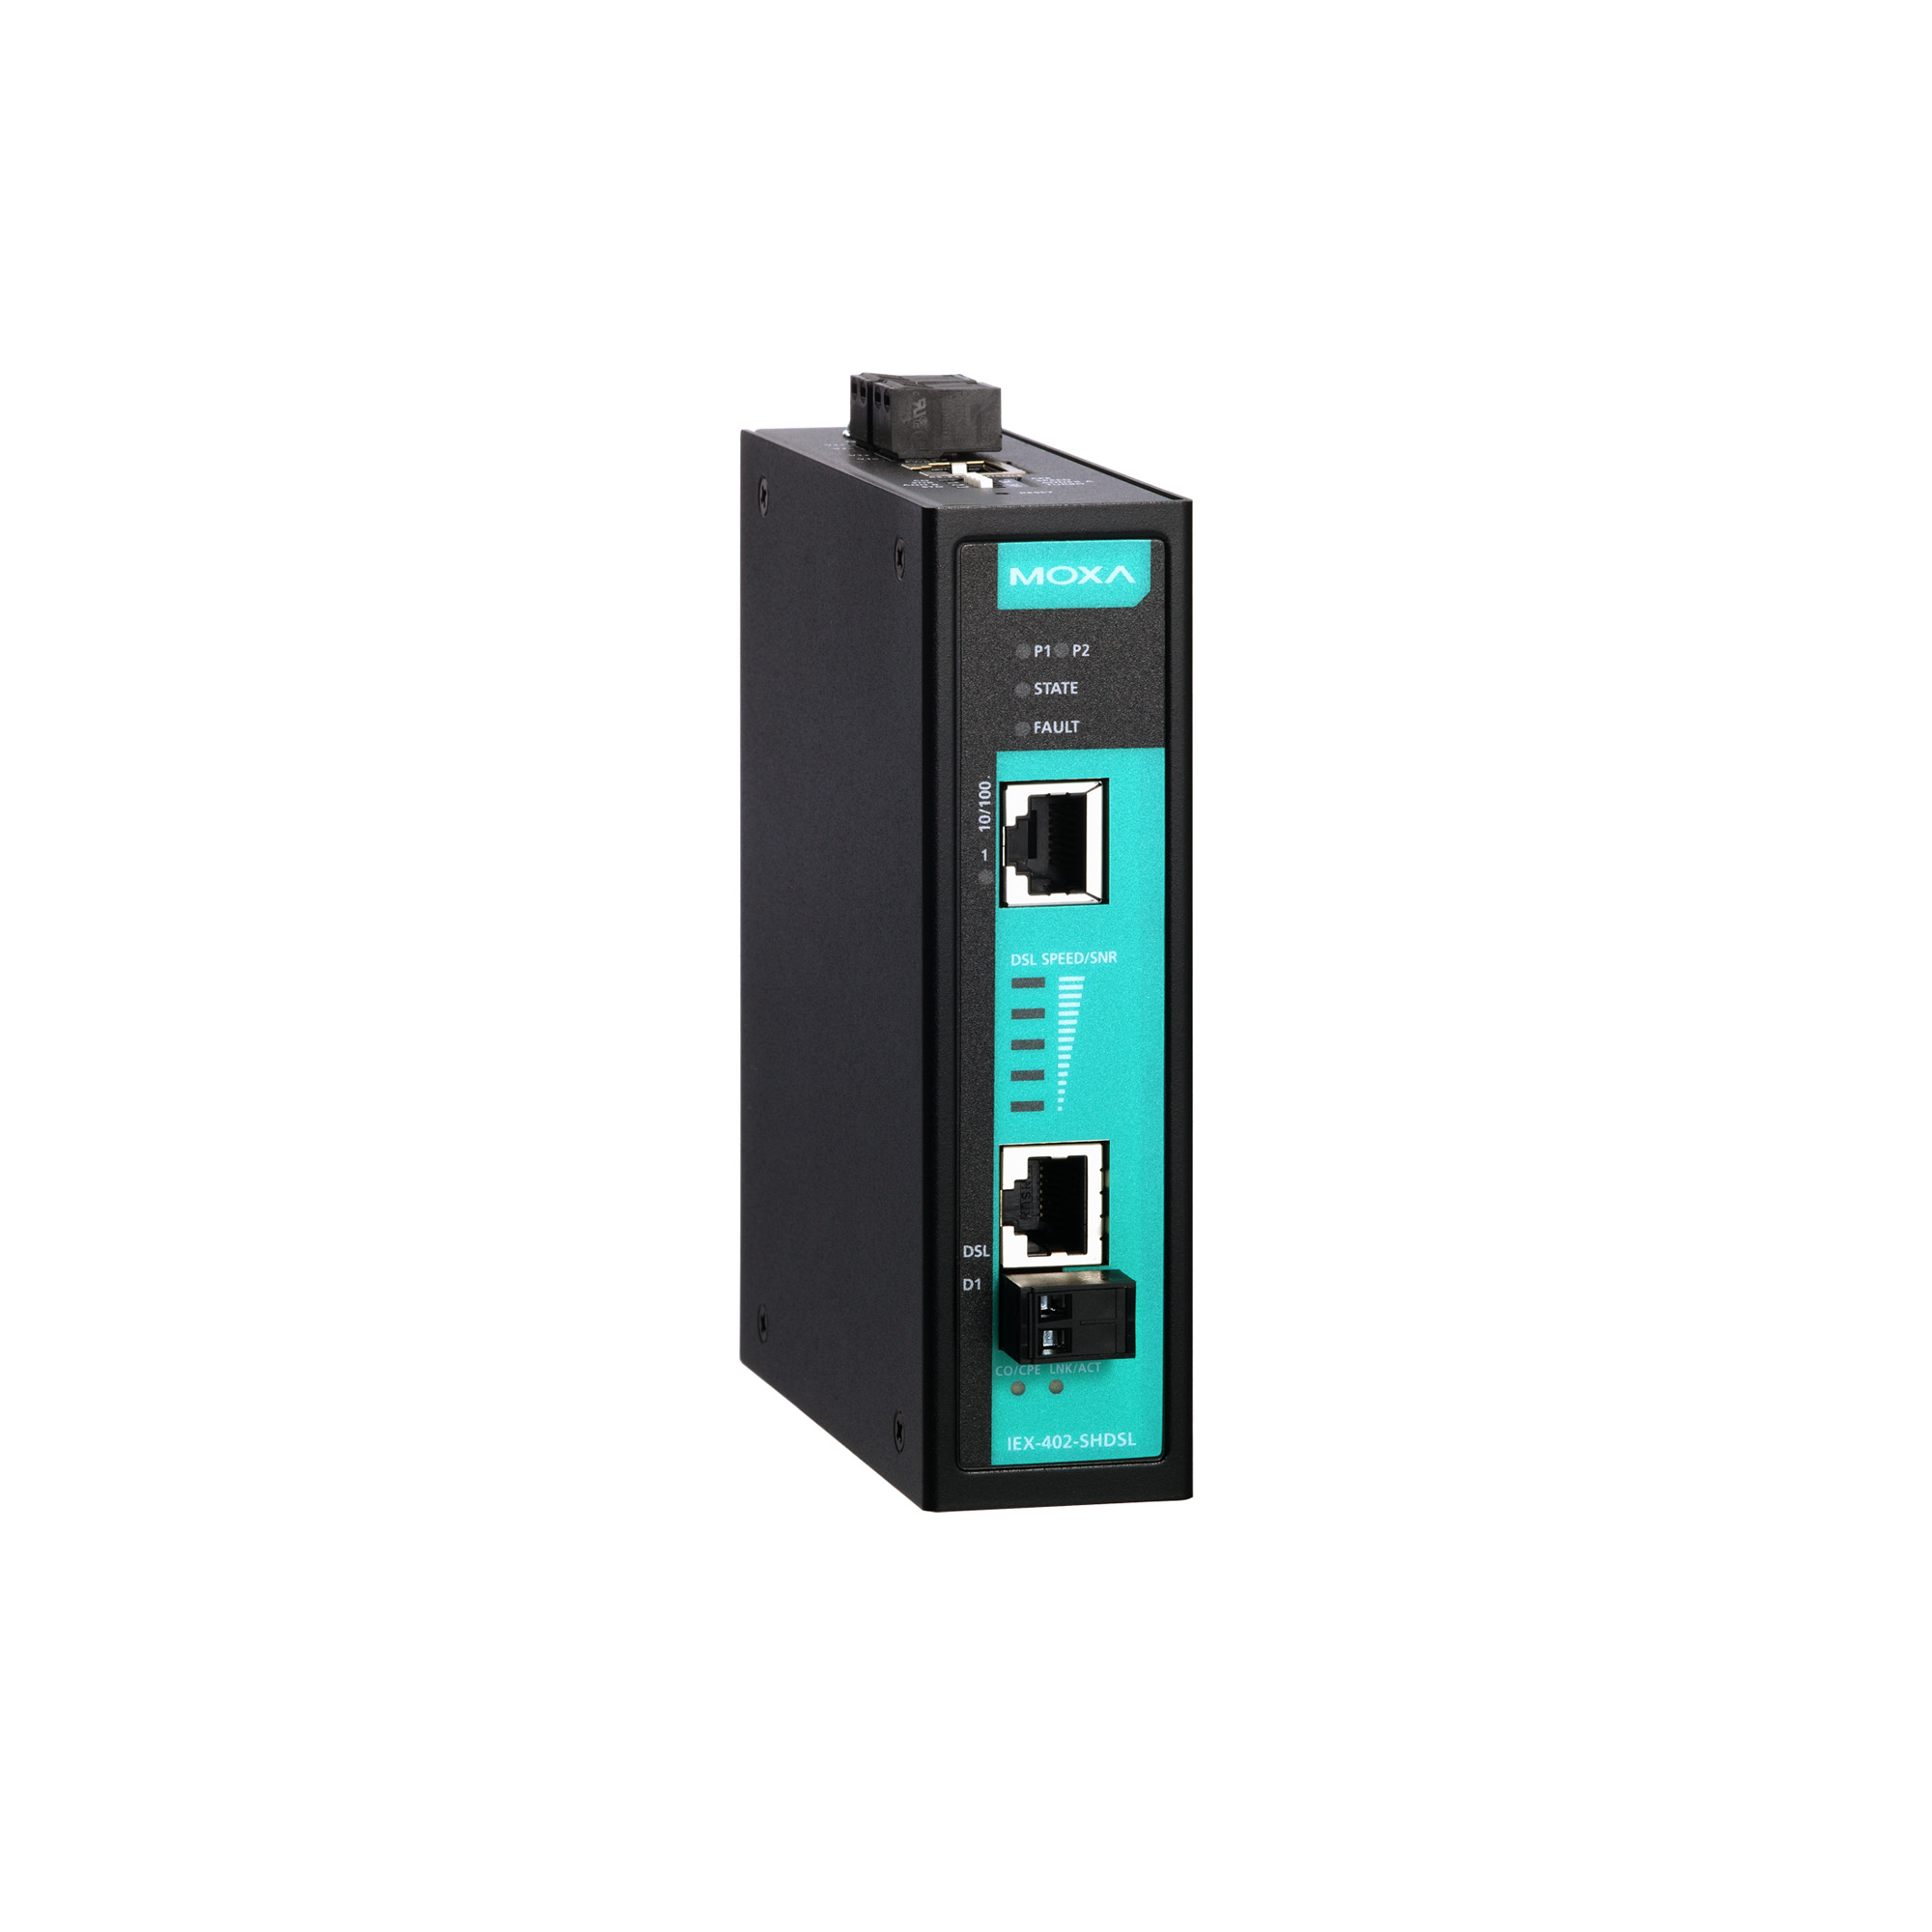 moxa iex-402-series 2000px